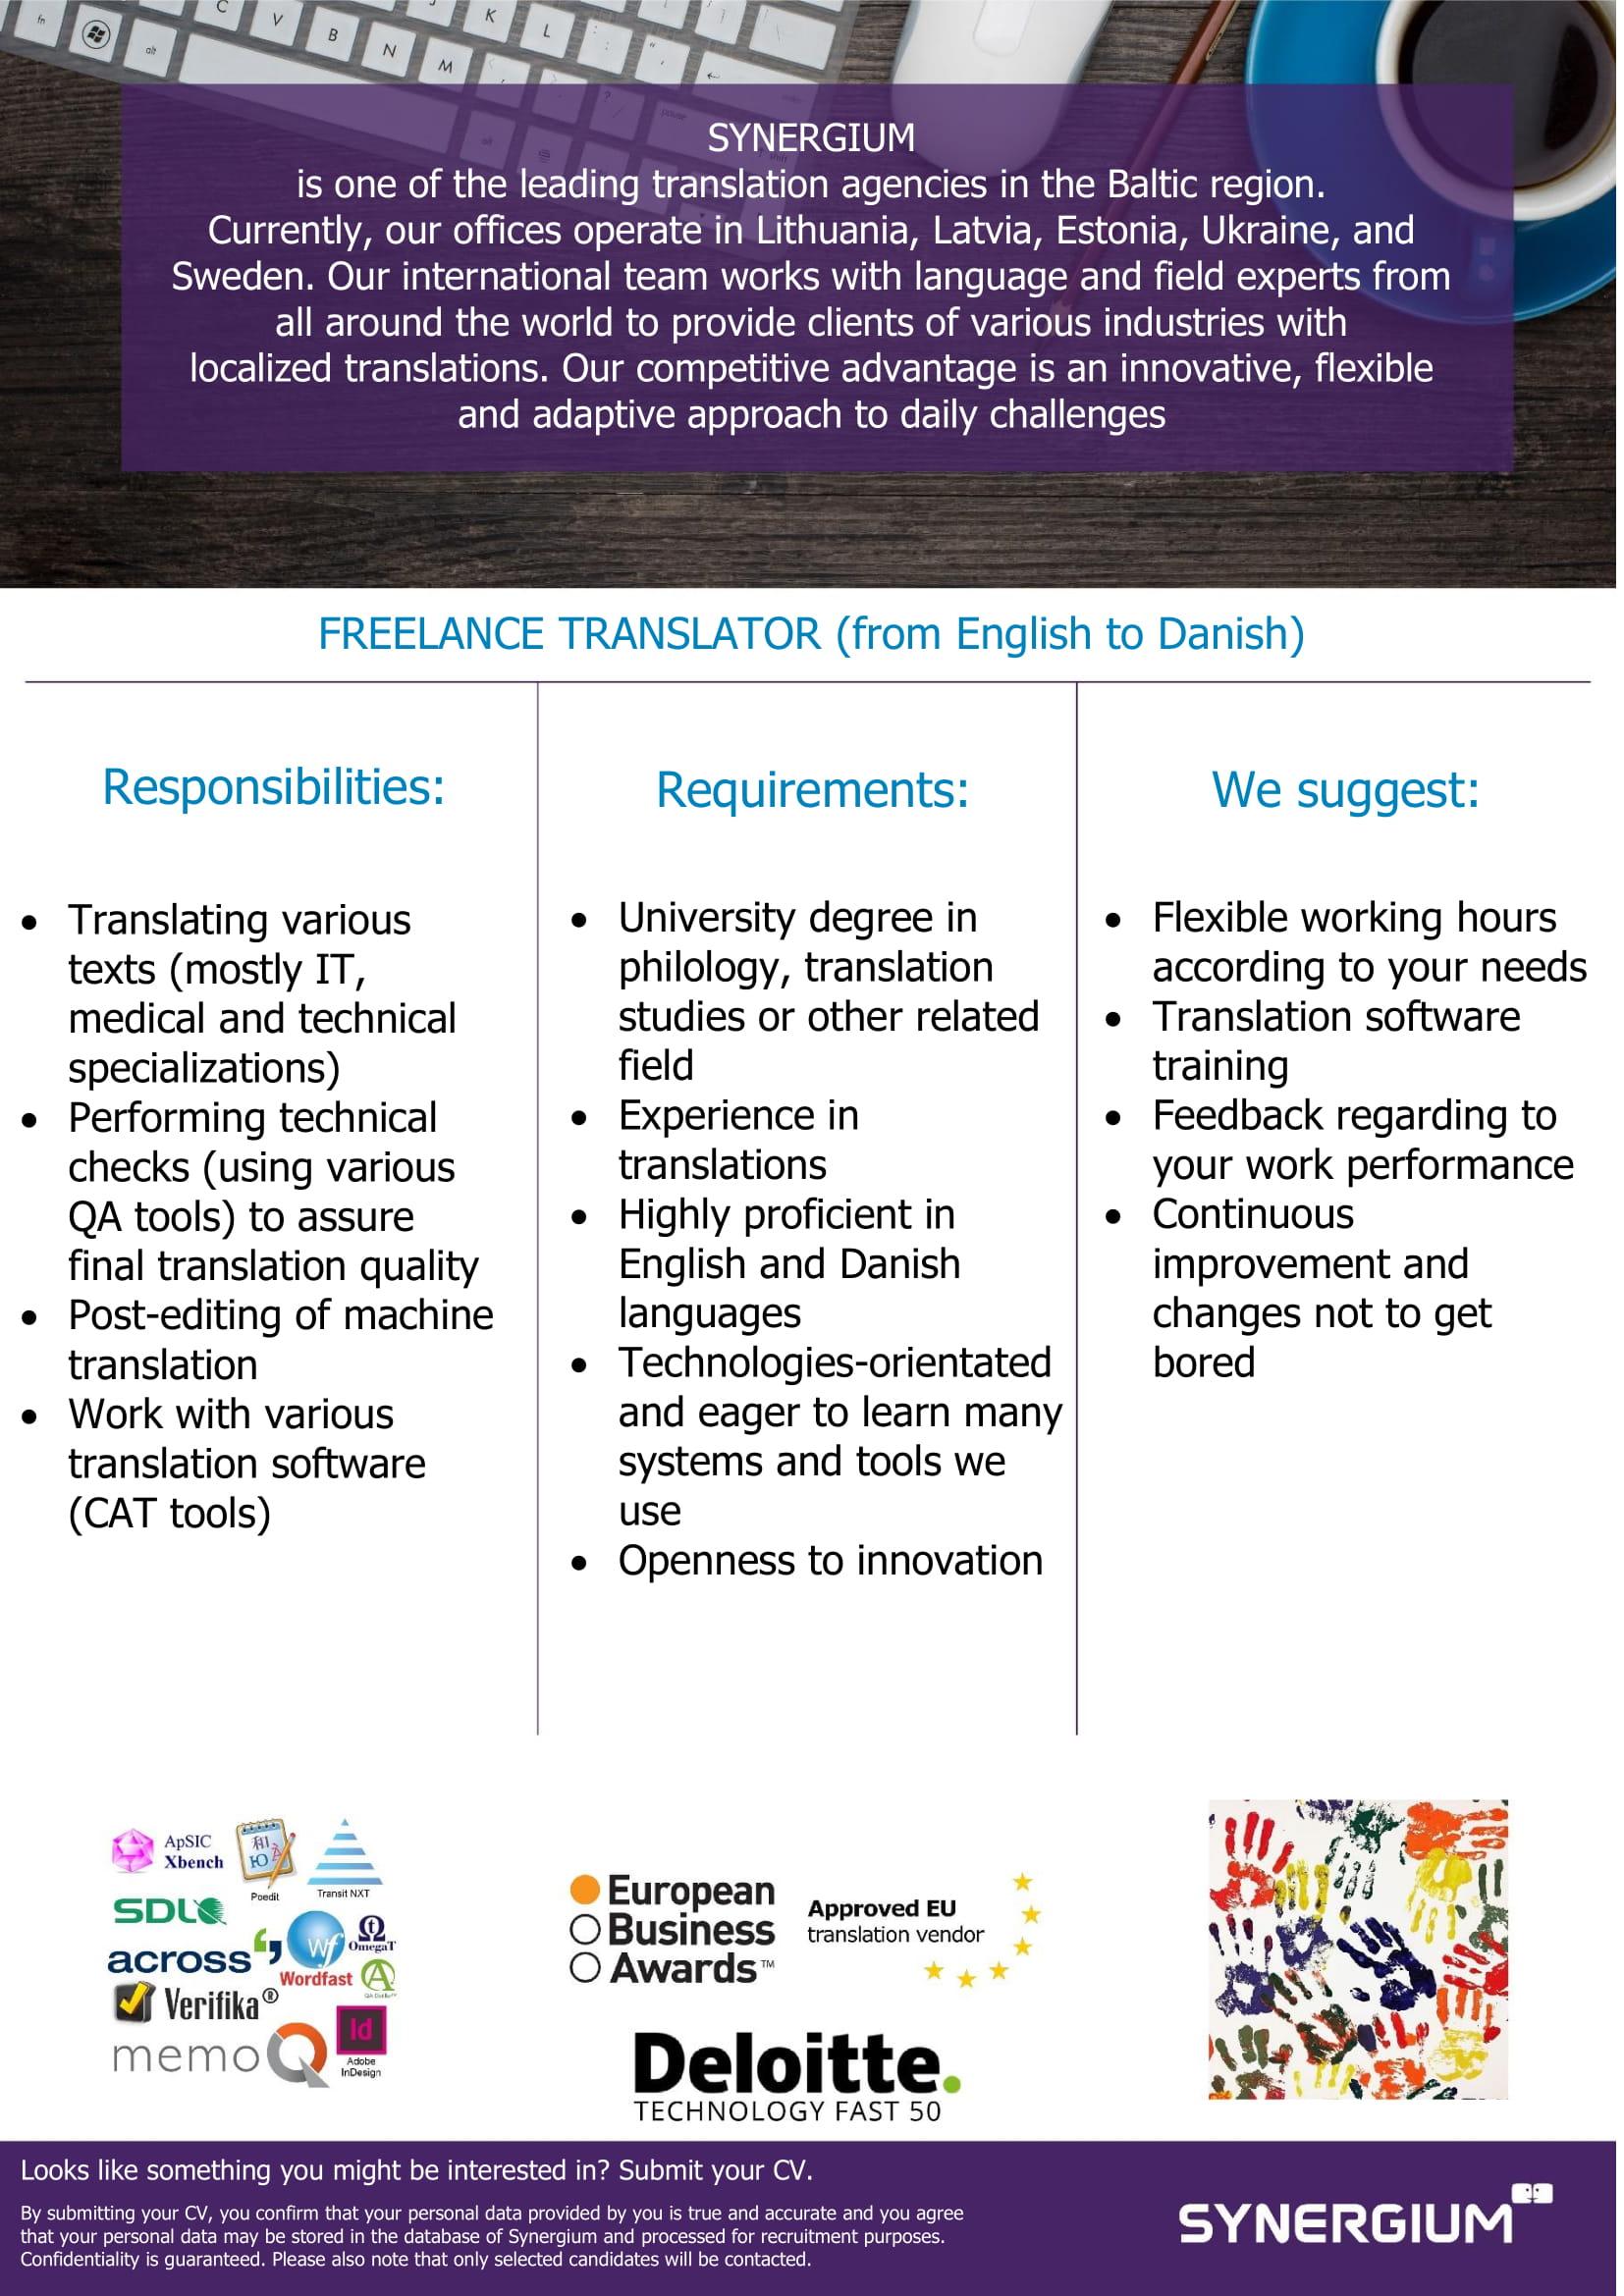 Synergium freelance translator from english to danish job advertisement